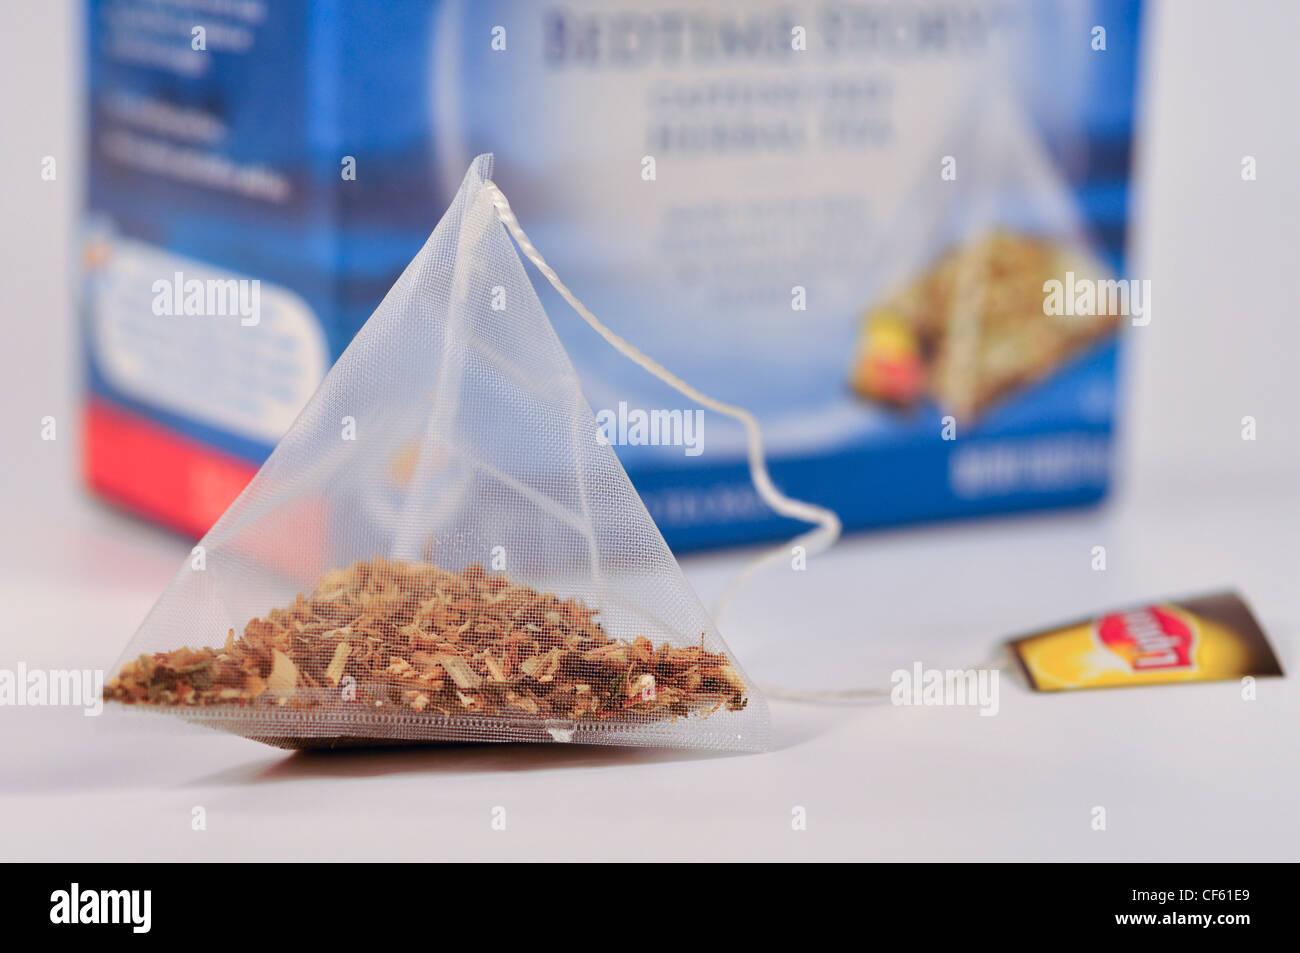 Lipton Teas Stock Photos Images Alamy Pyramid English Breakfast 25s Tea Package Image